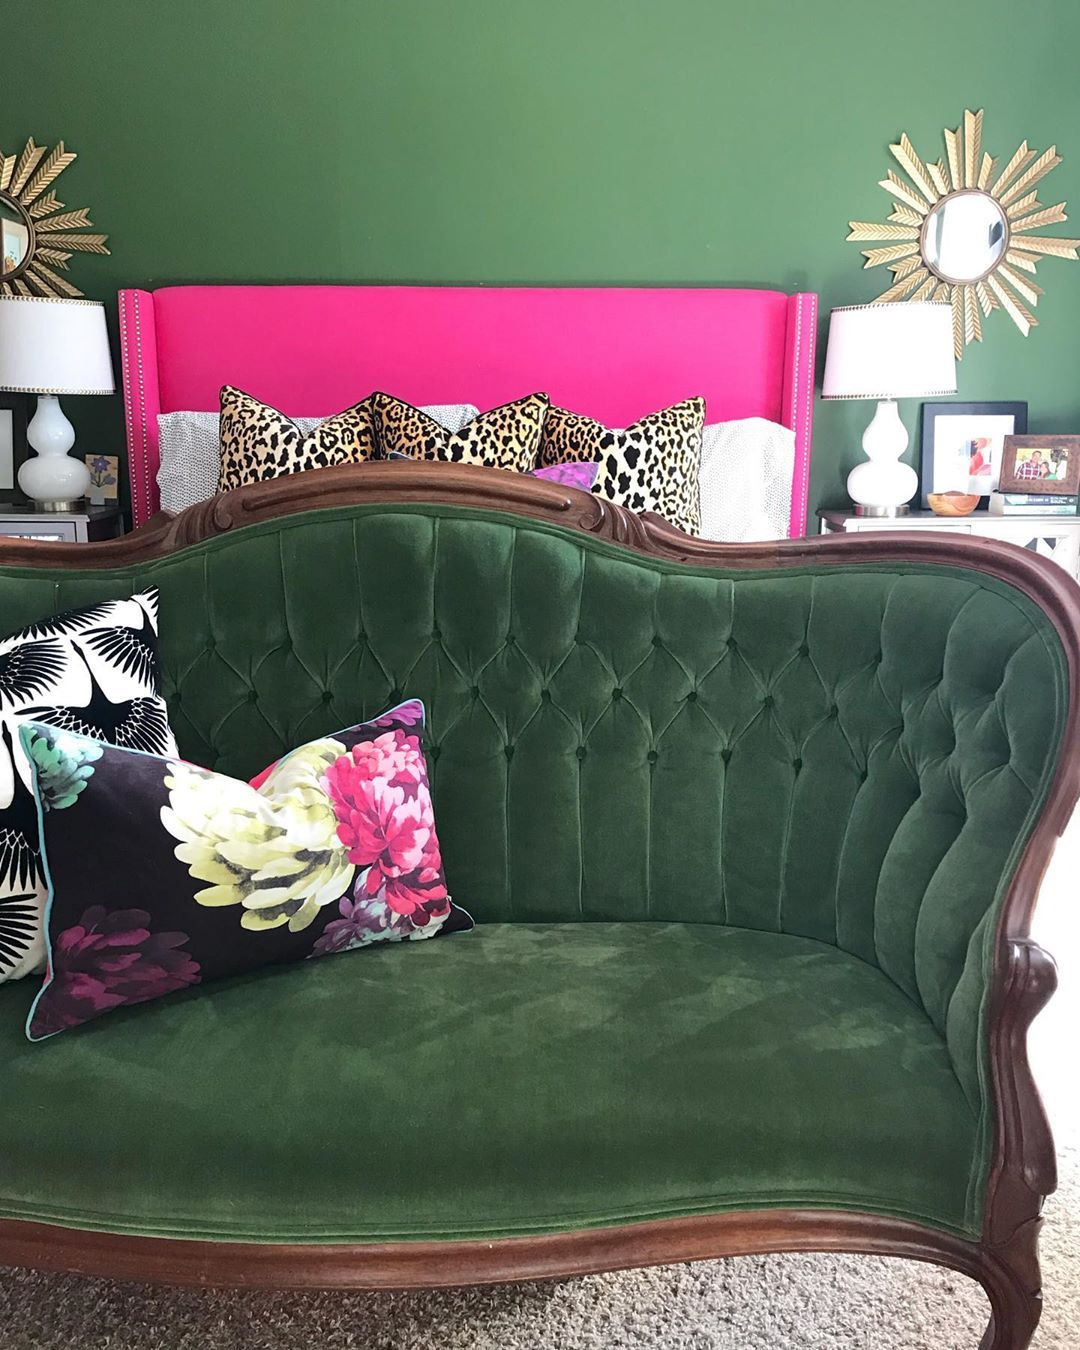 Dark Green Walks With Fuschia And Leopard Print Leopard Print Bedroom Room Design Bedroom Decor